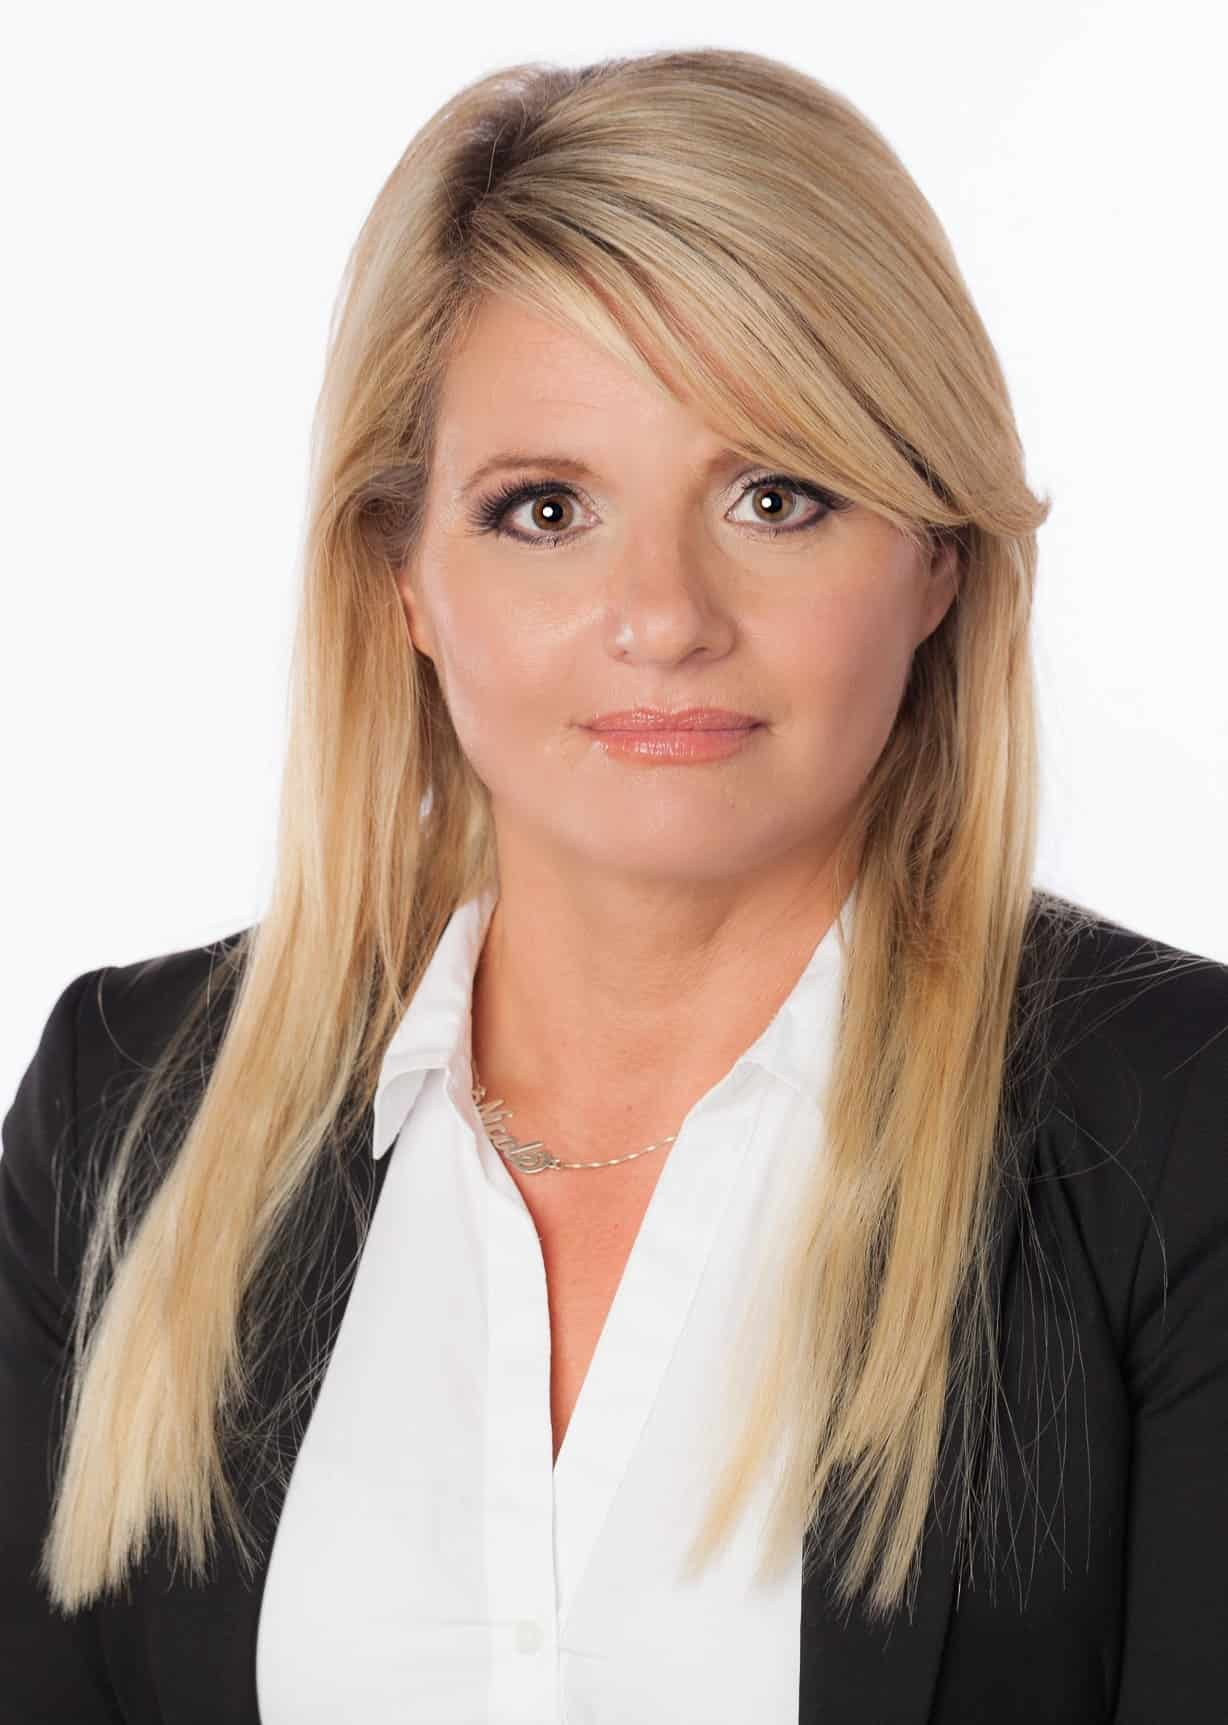 Nicole Stegman Chambless